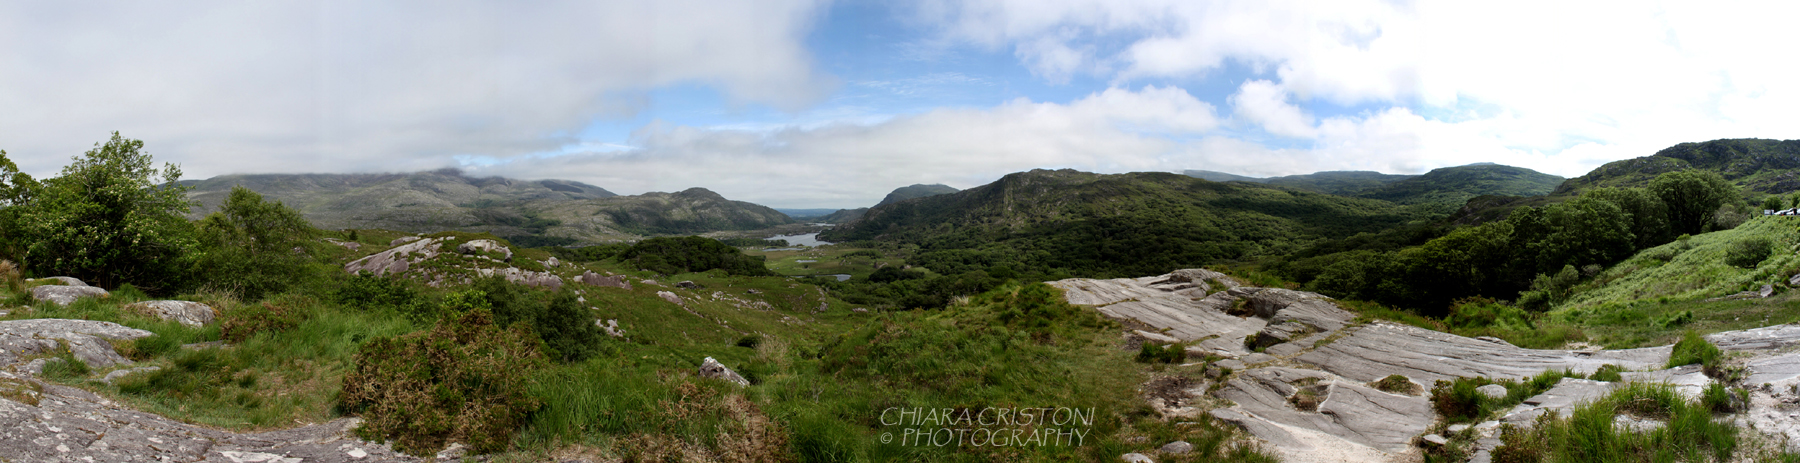 Panorama from Ladies View, Killarney